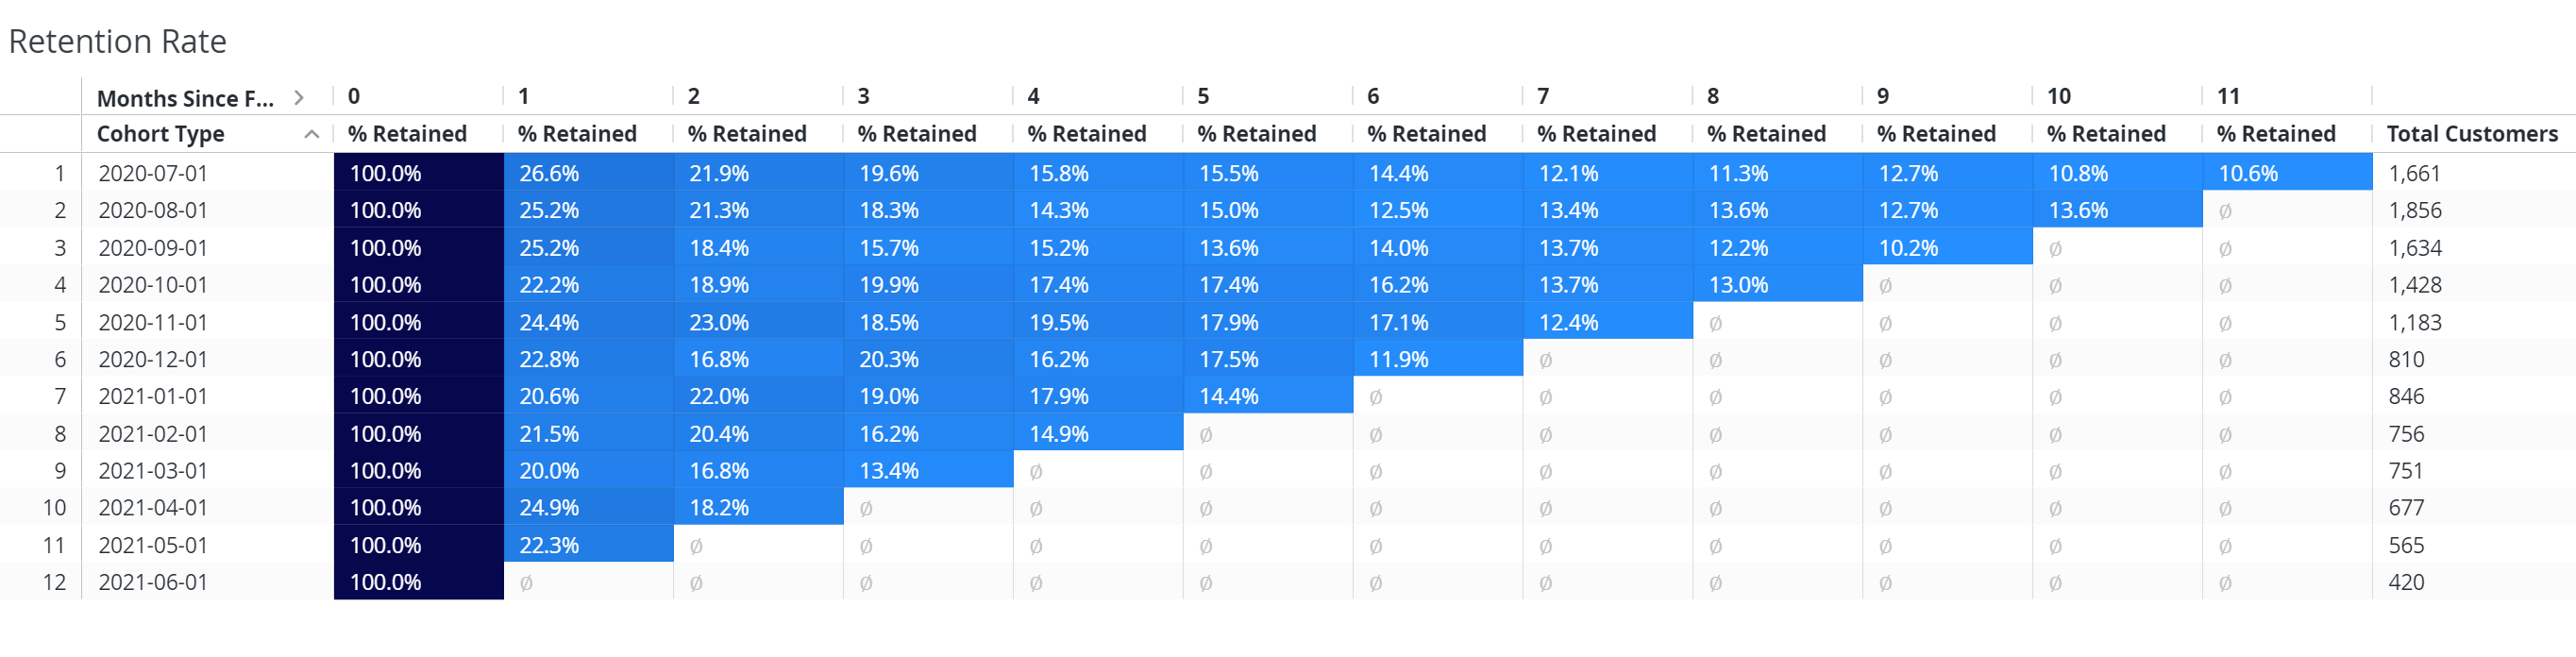 Customer retention report: Customer retention rate in cannabis retail